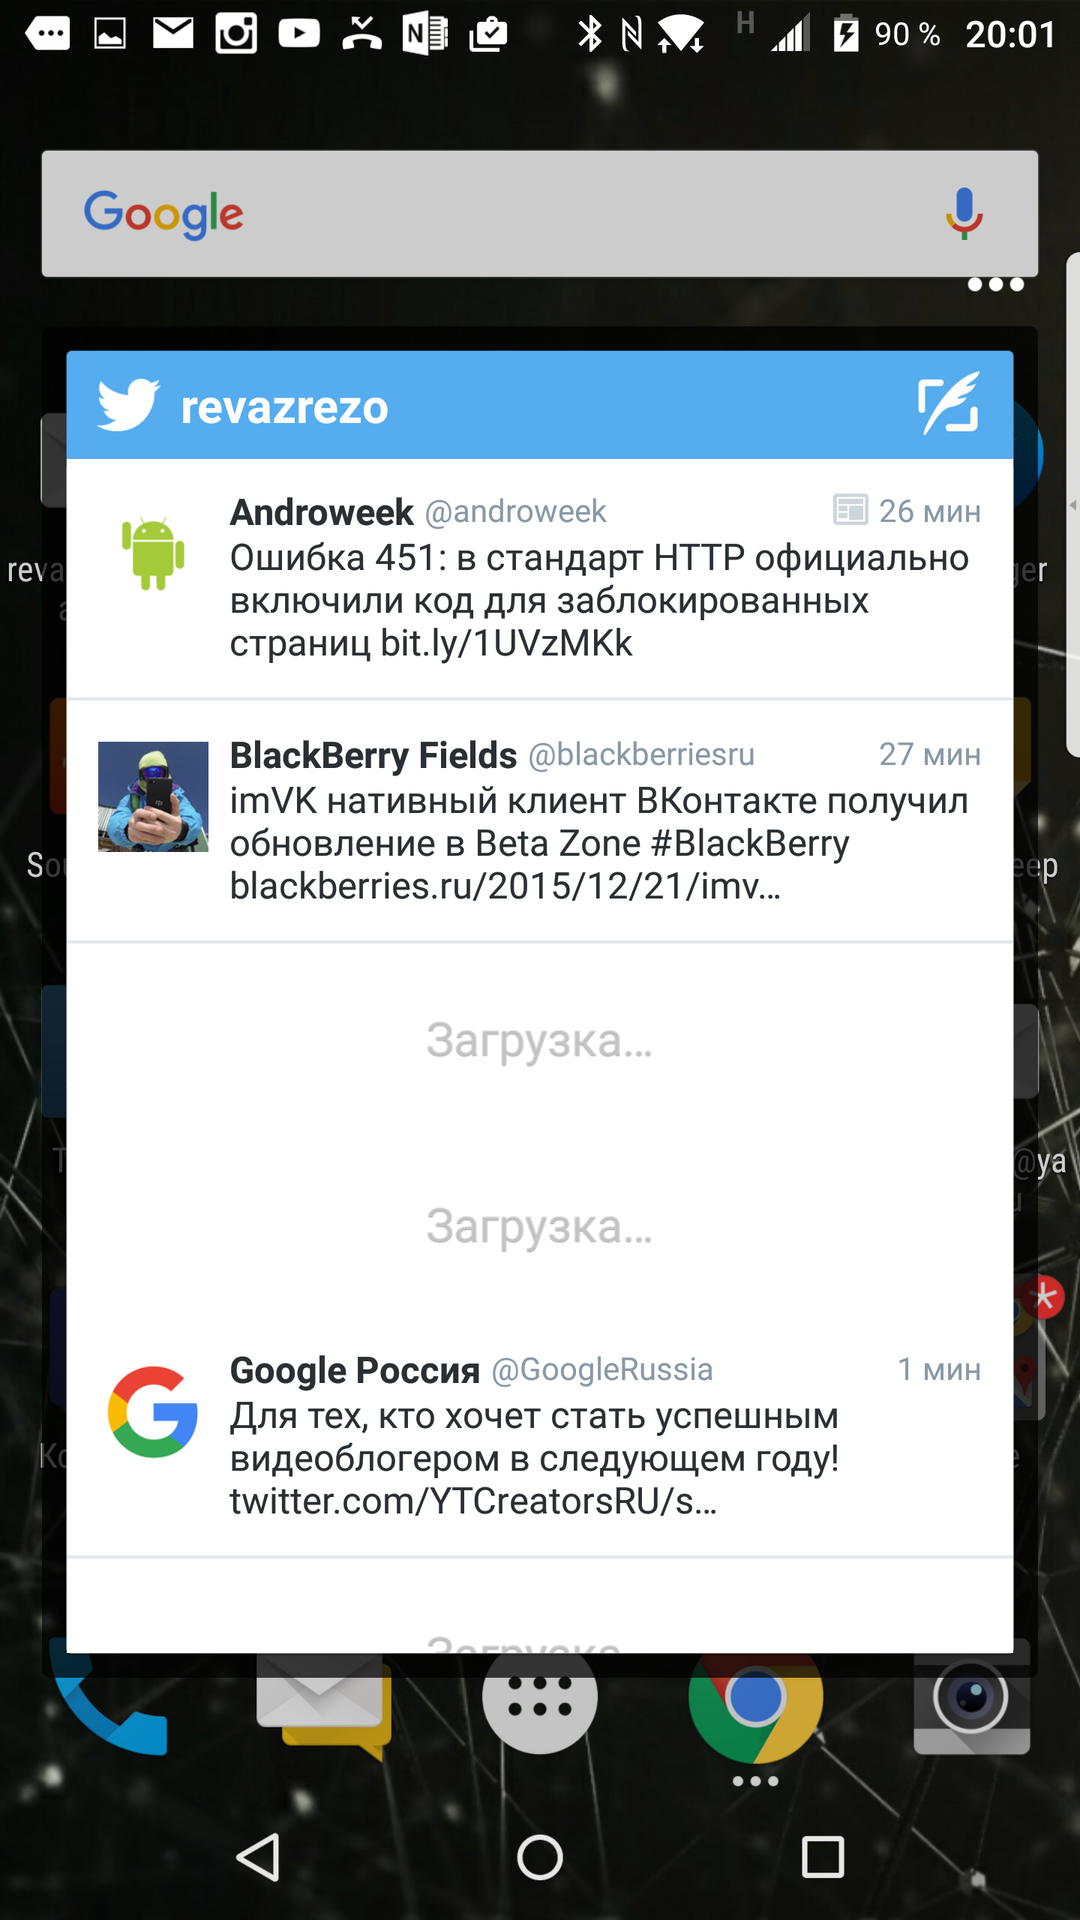 screenshot2015-12-21-20-01-28-1080x1920